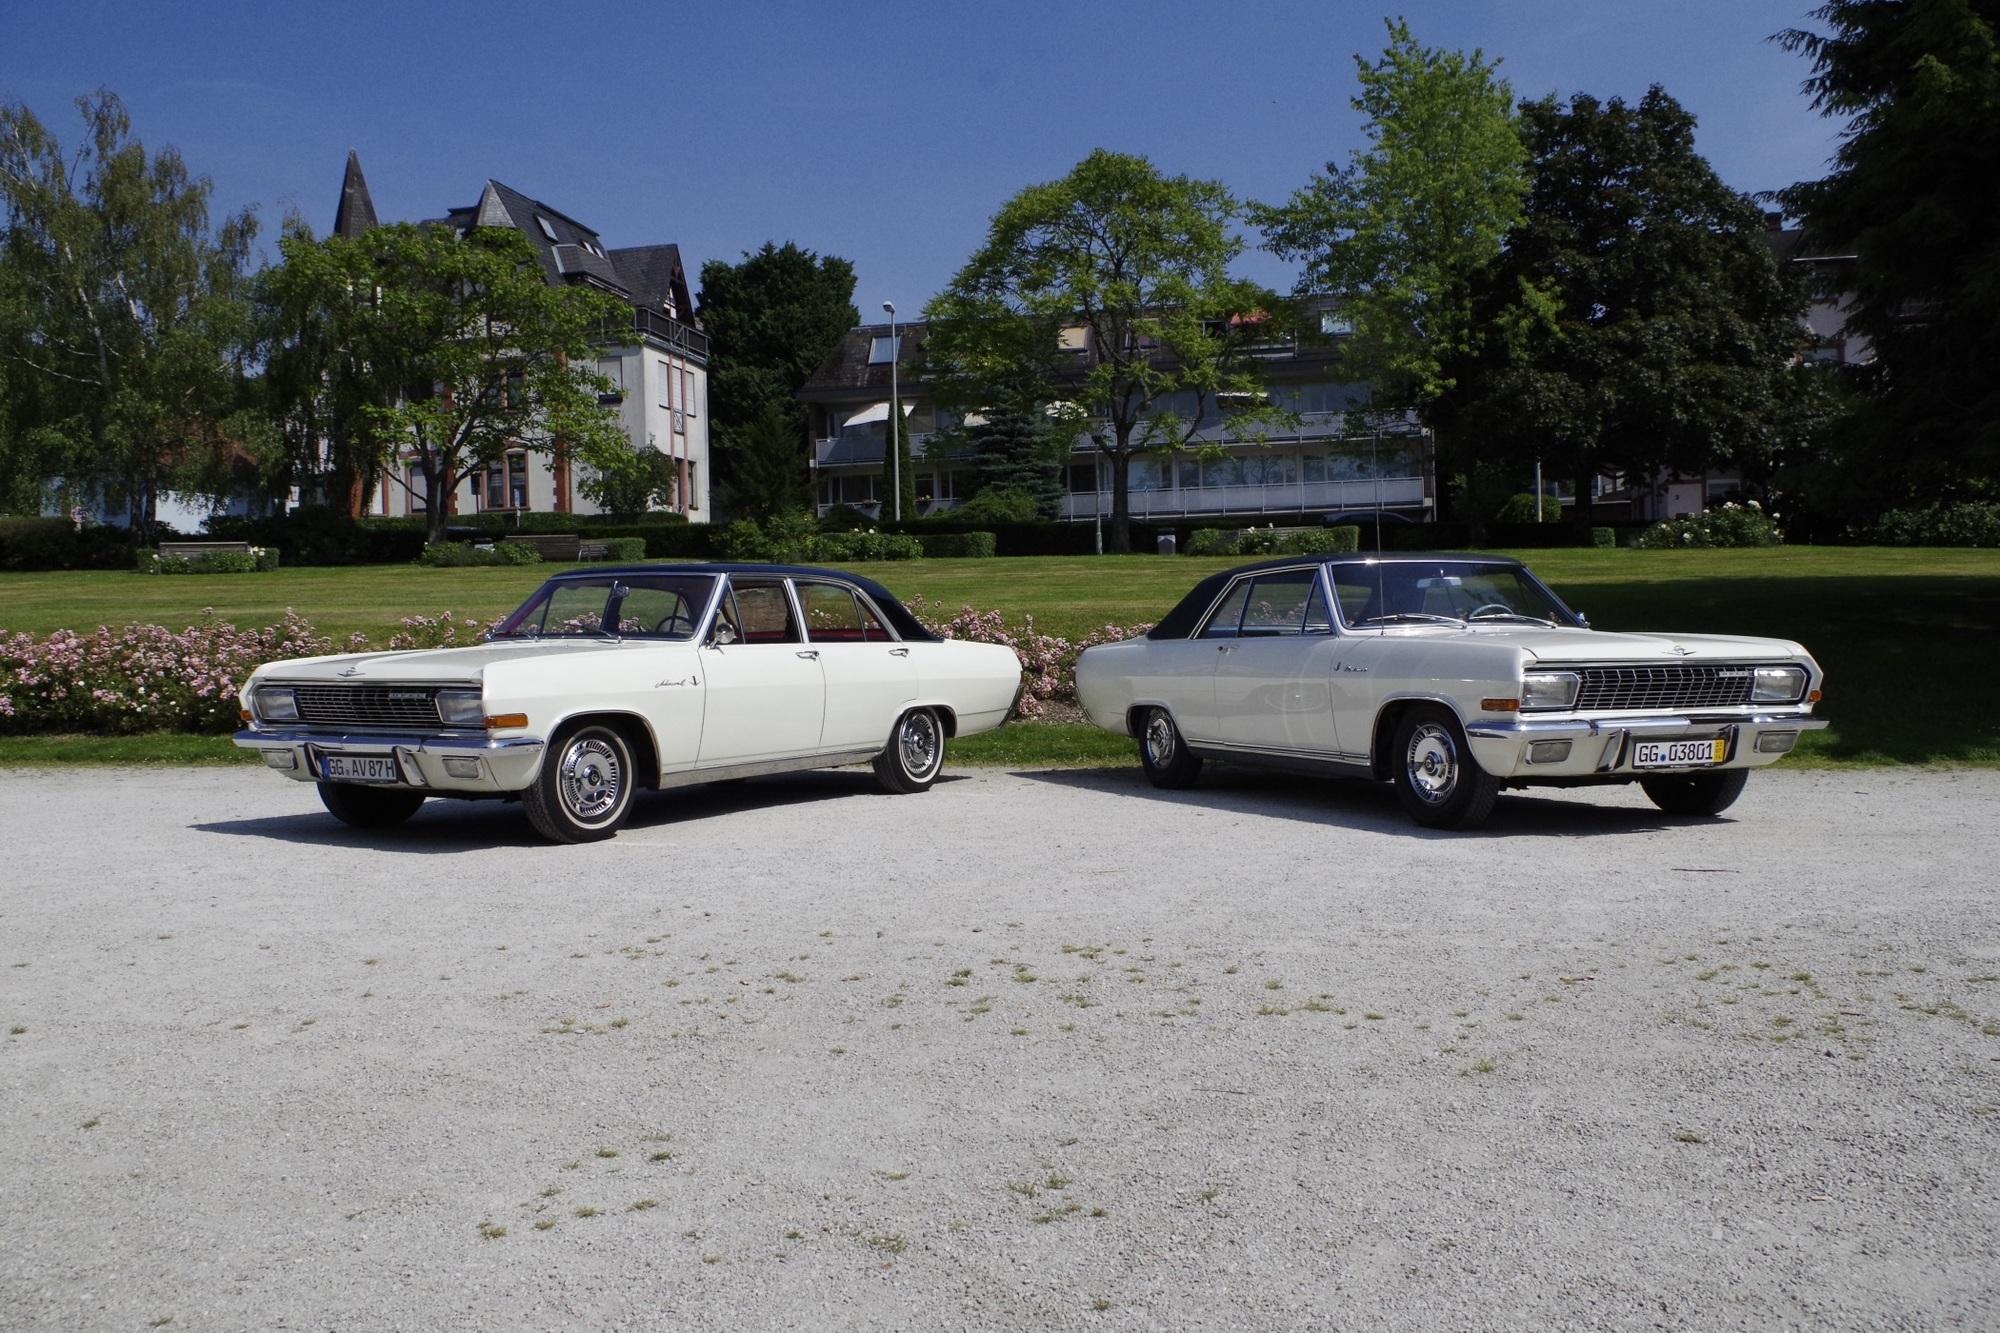 Oldtimer Fahrbericht: Opel KAD A - Ganz schön (ober)klasse